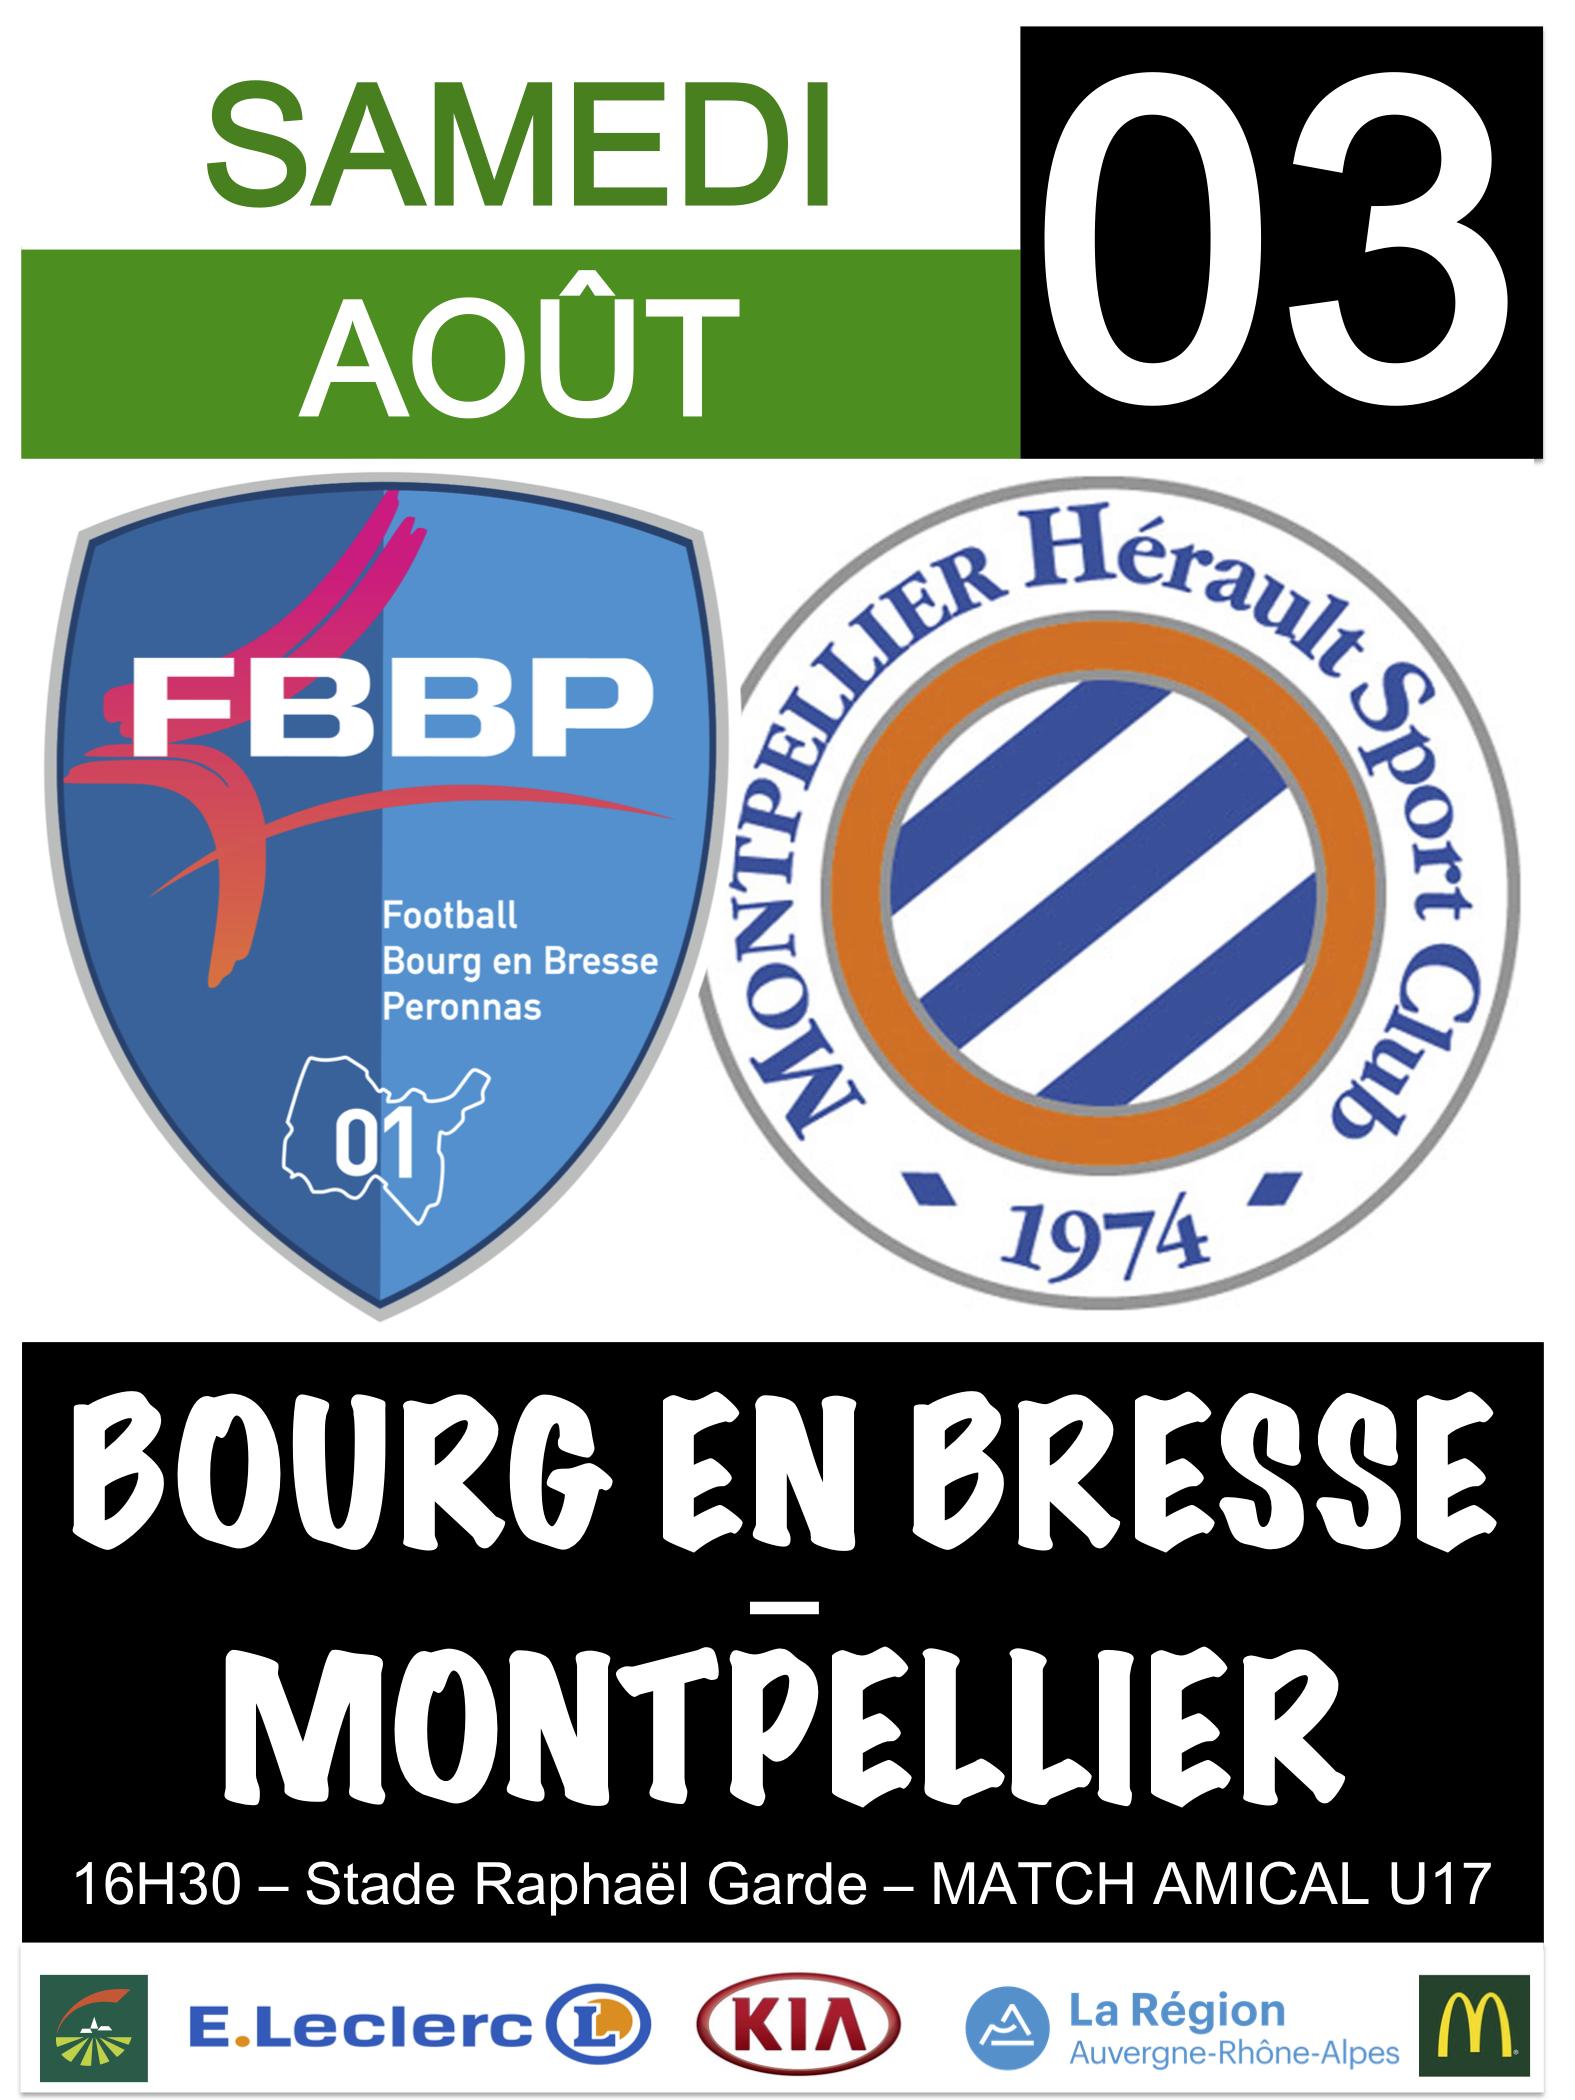 U17 - Match de gala entre Montpellier et Bourg-Péronnas ce samedi